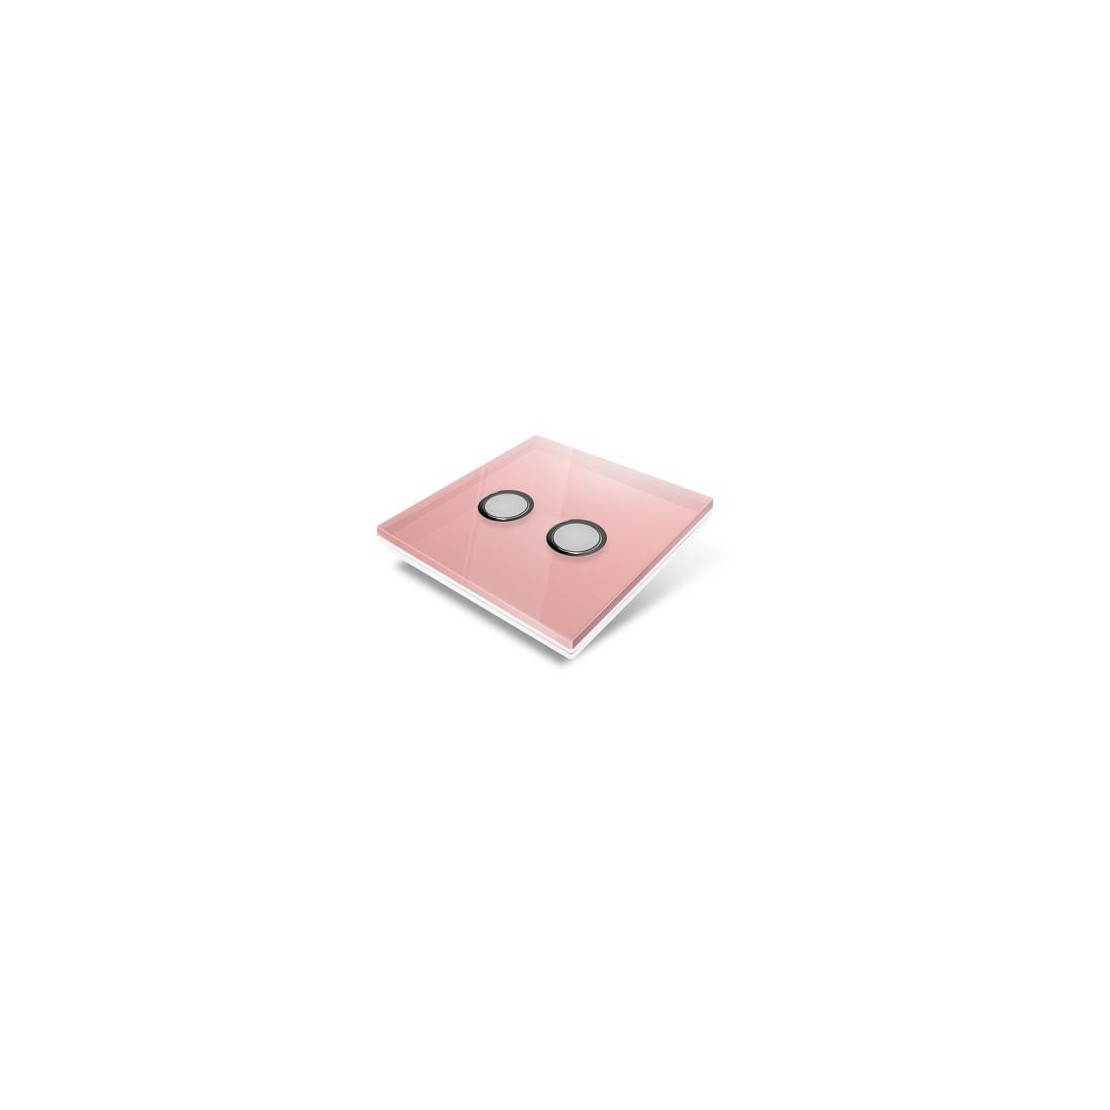 Cubierta para interruptor Edisio - crystal rosa